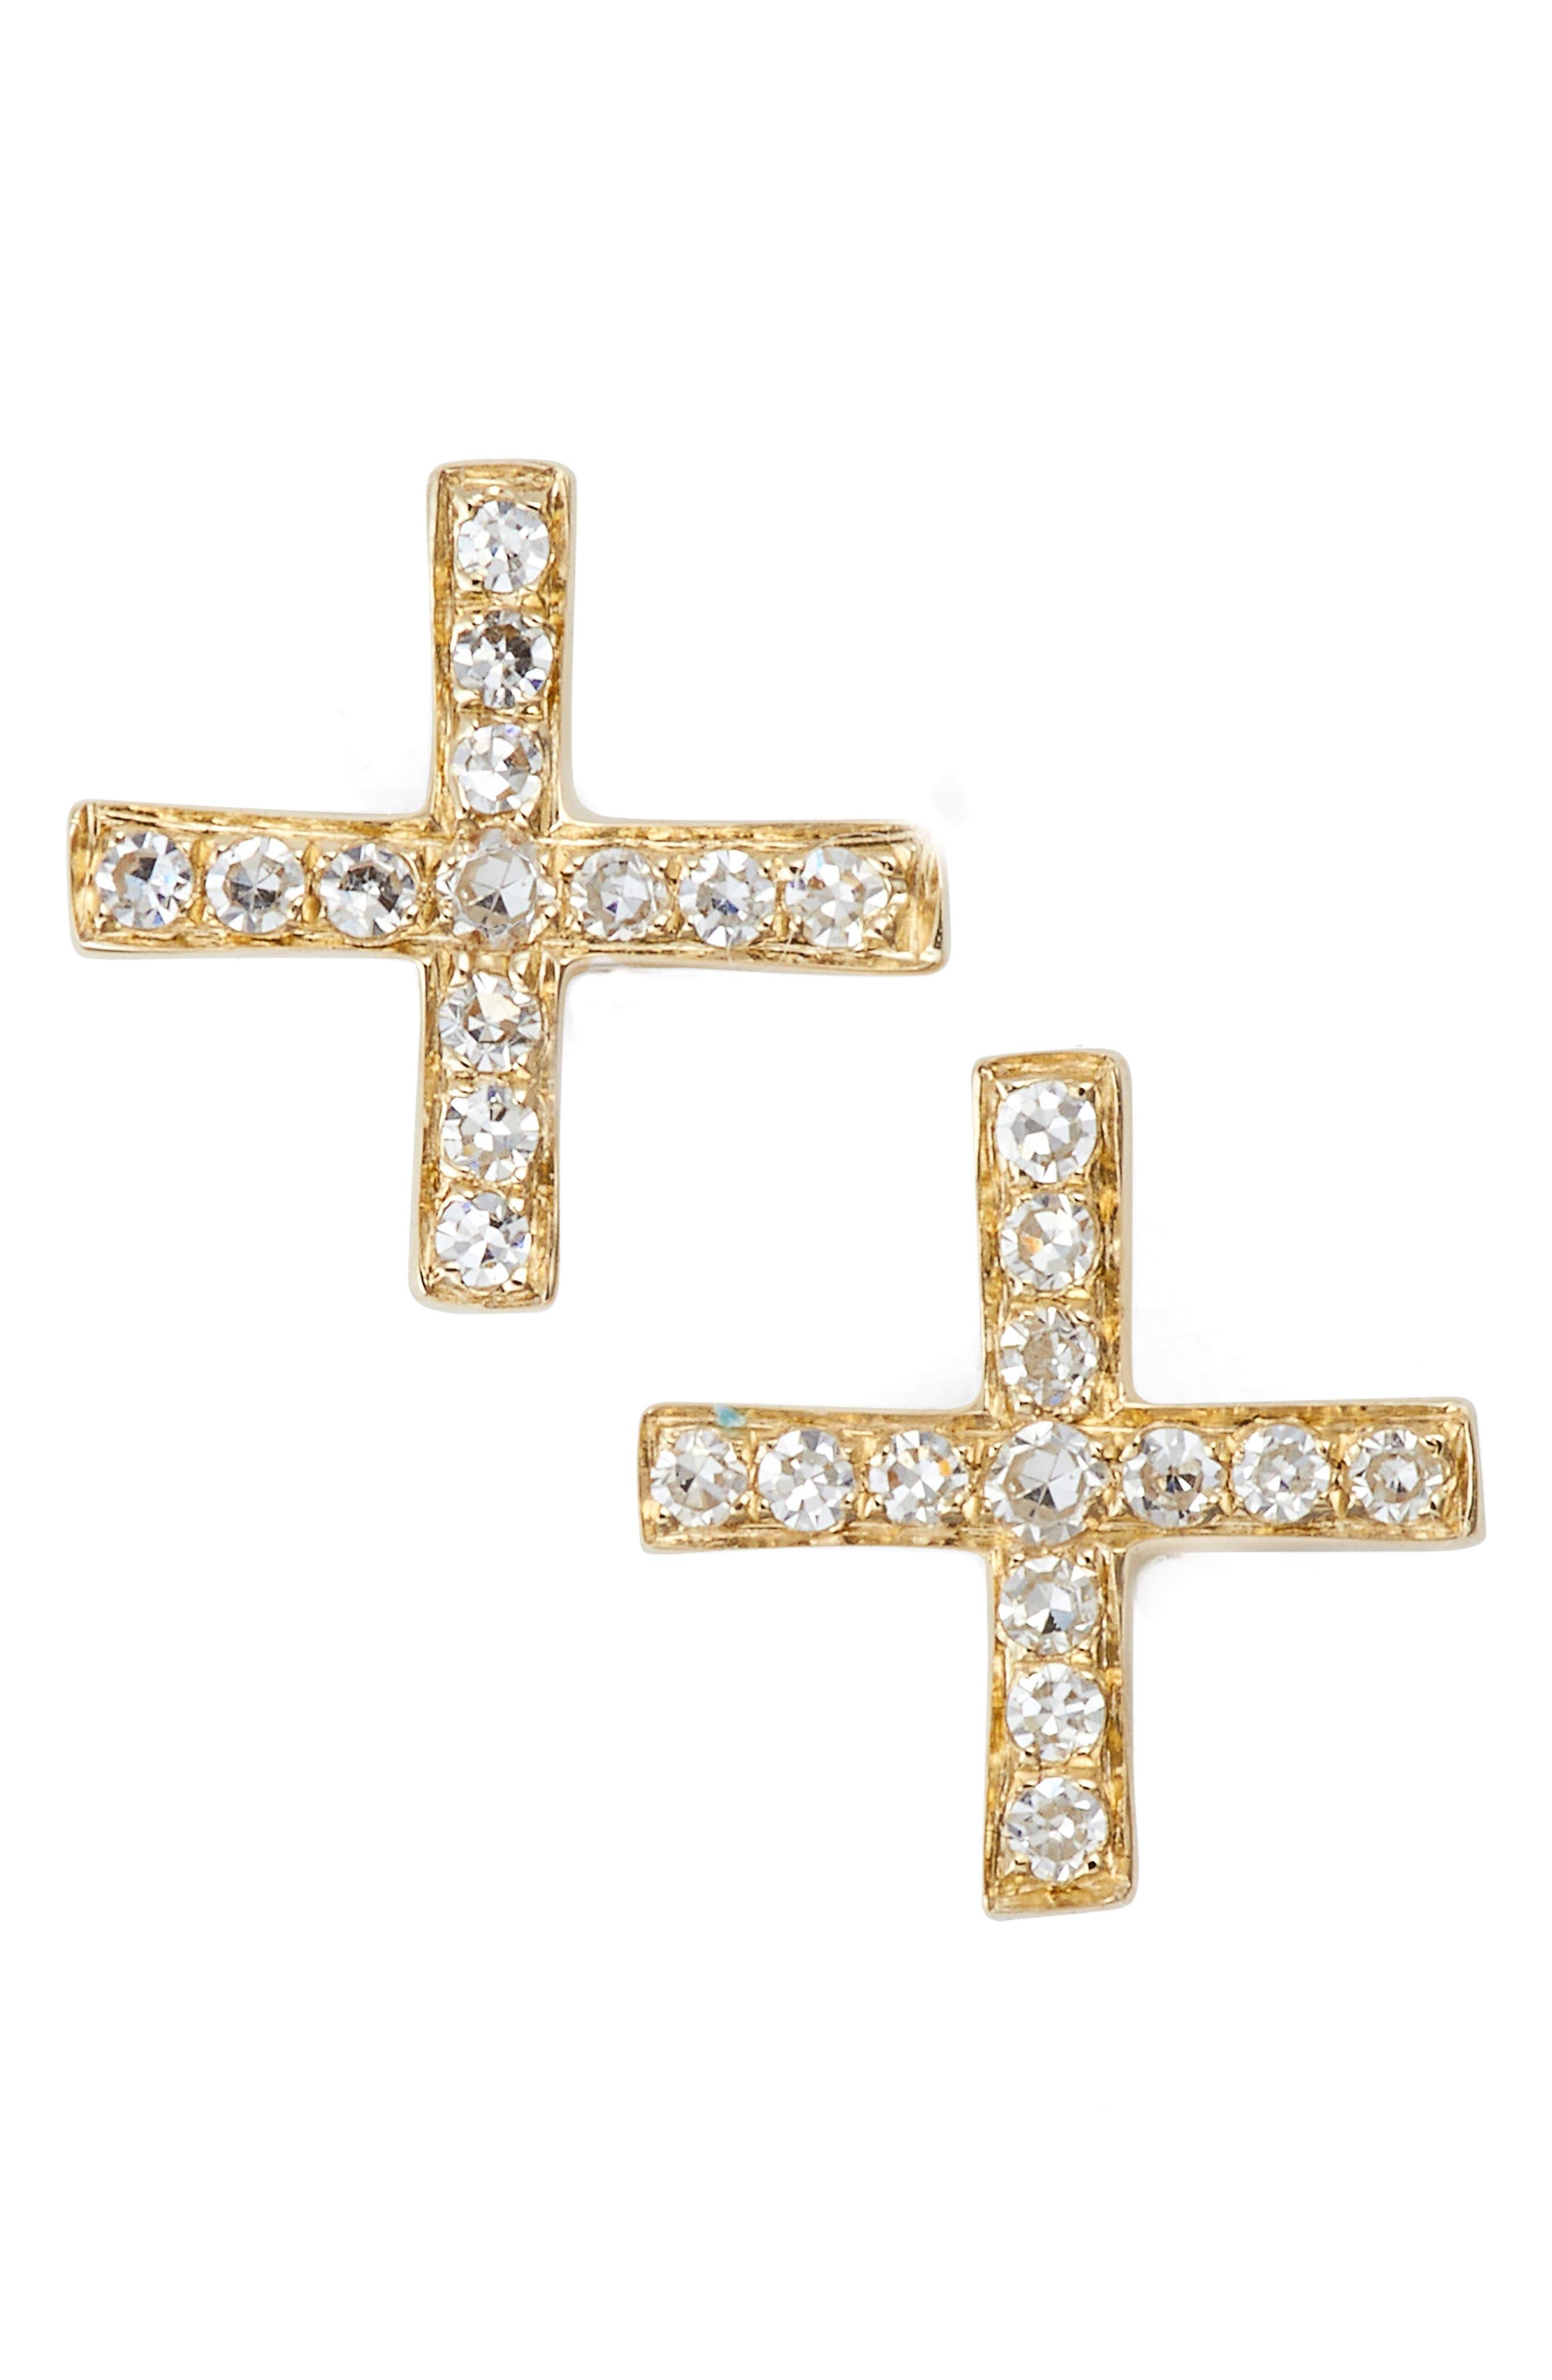 Diamond X Stud Earrings,                             Main thumbnail 1, color,                             710